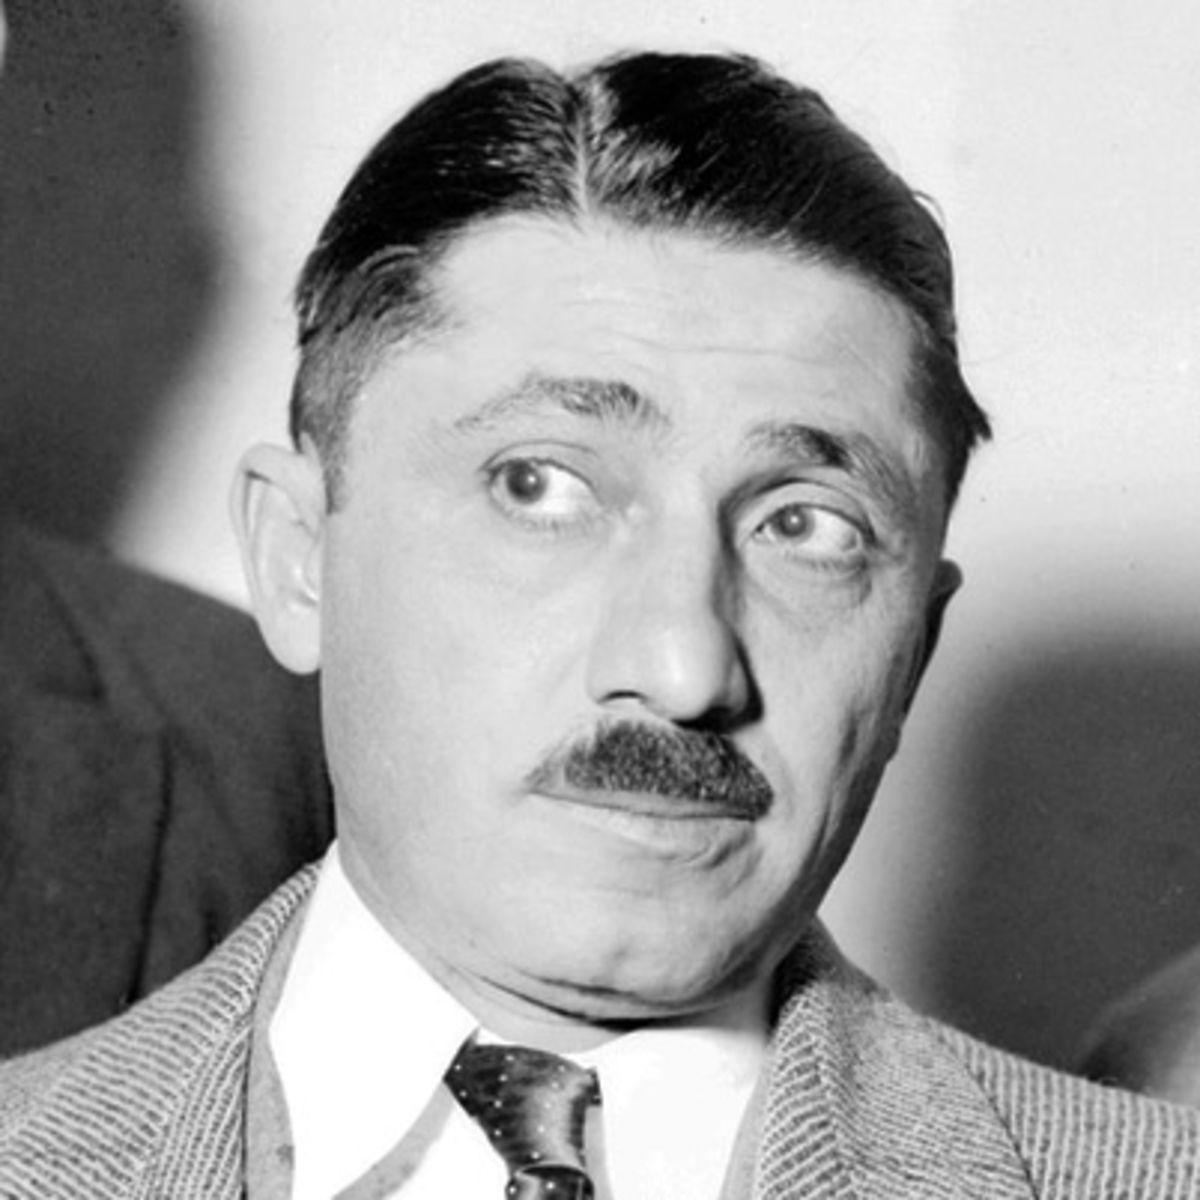 Frank Nitti